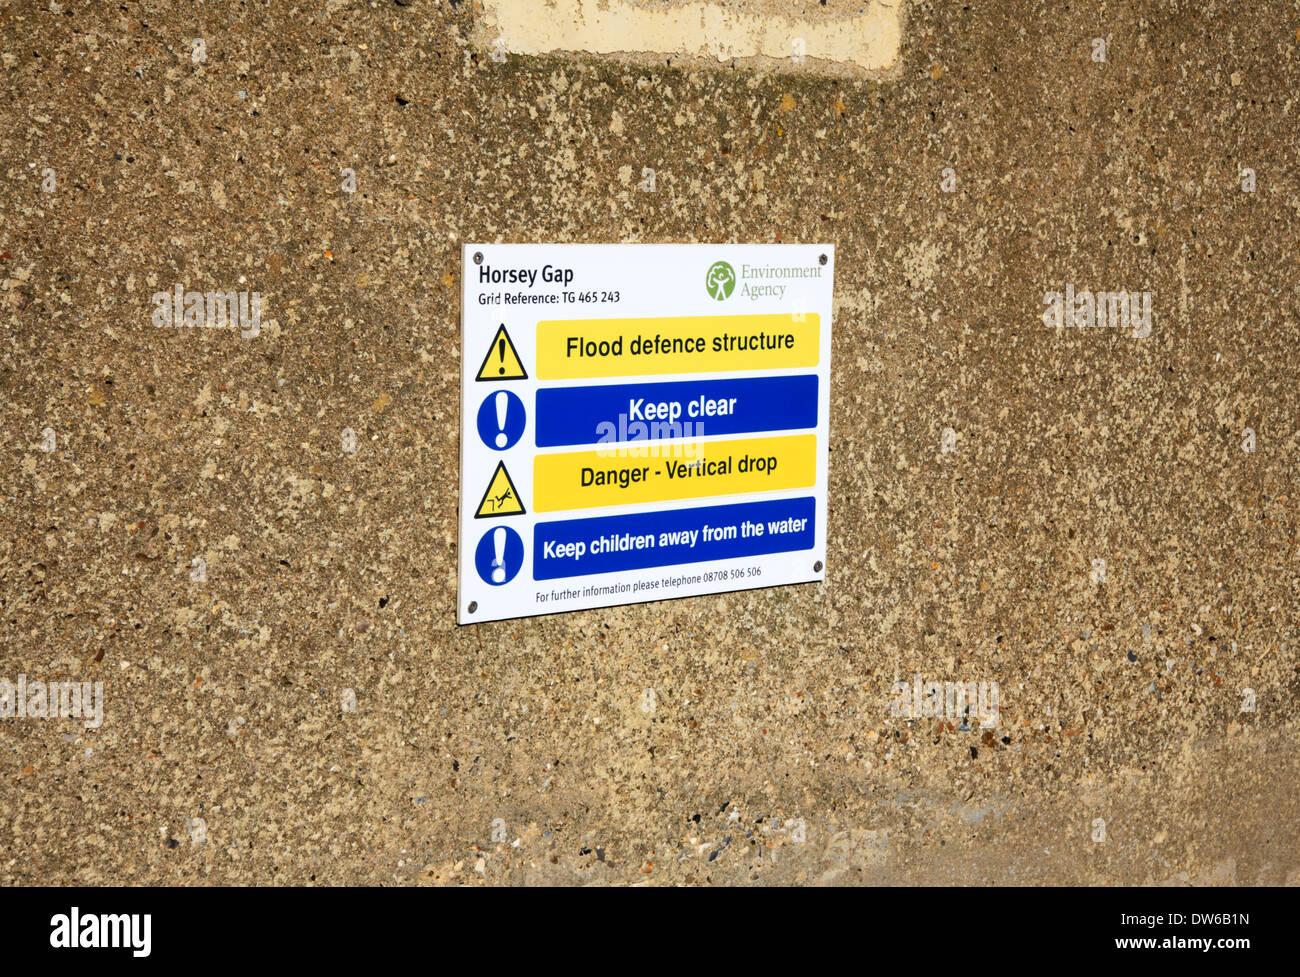 A hazards sign at Horsey Gap, Norfolk, England, United Kingdom. - Stock Image